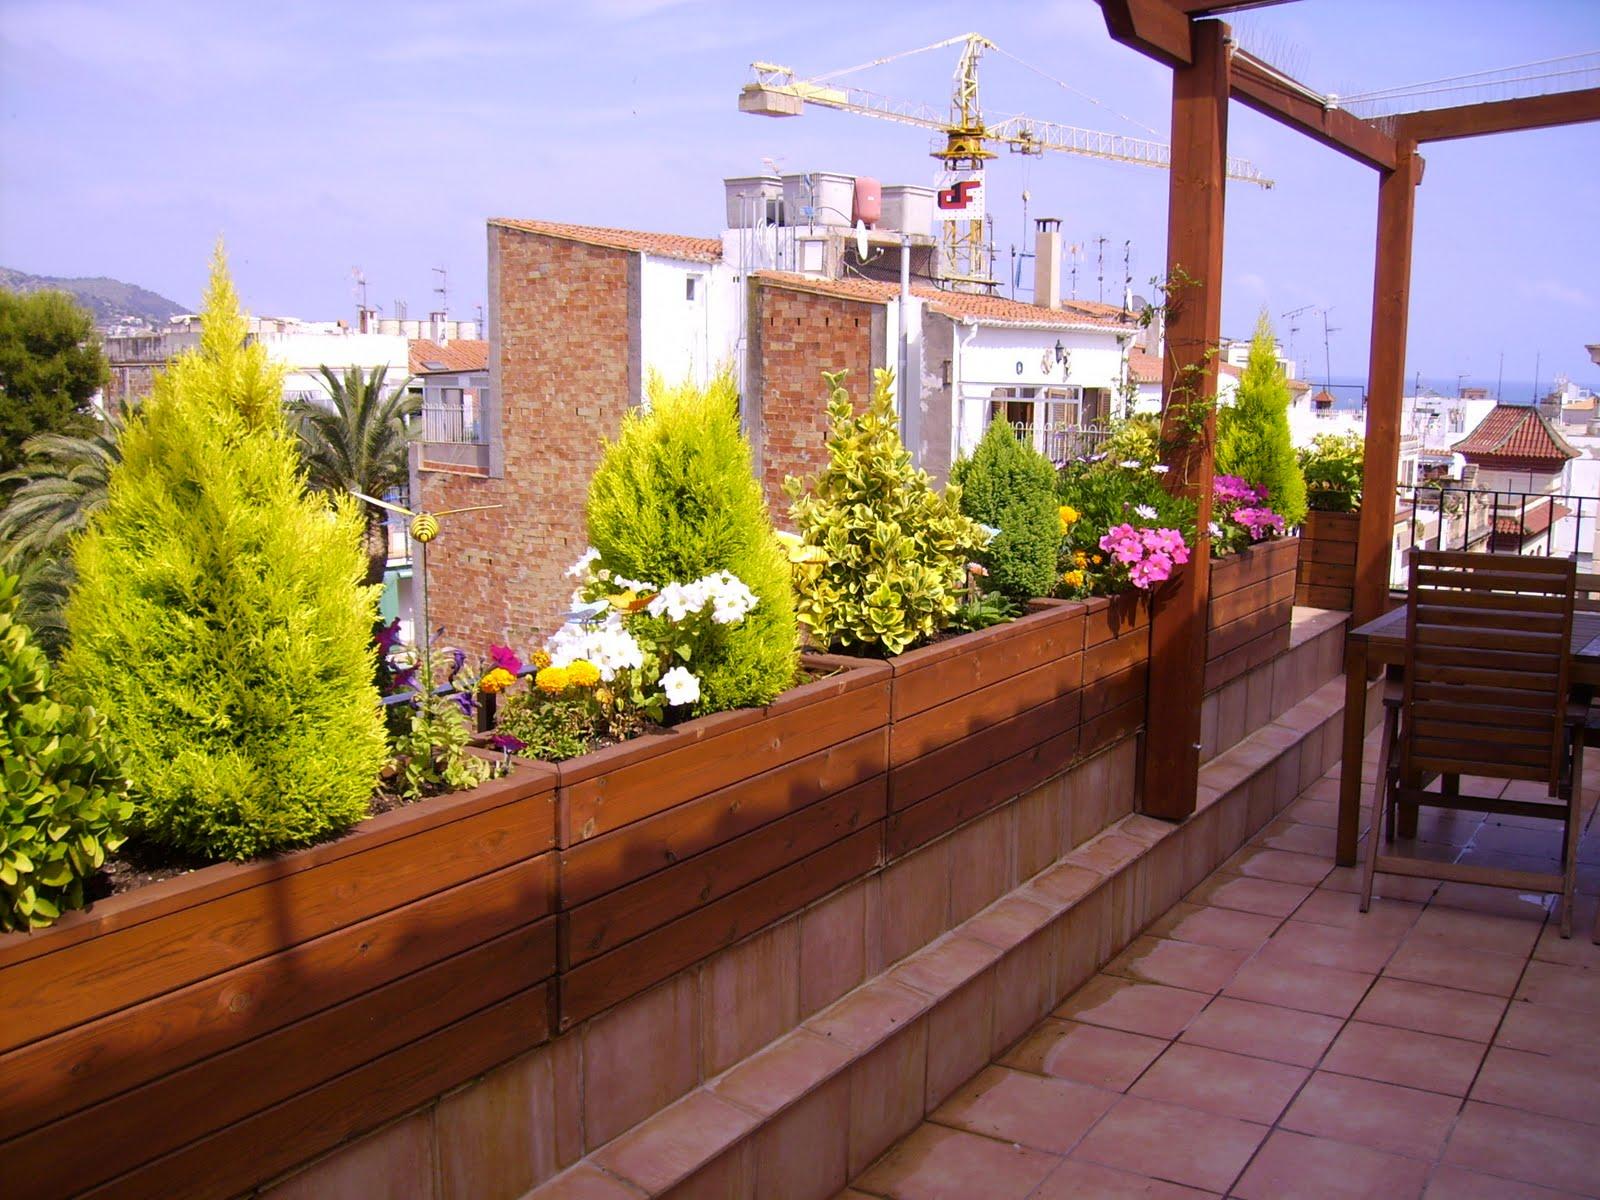 Jardineras de madera de pino a medida para terrazas for Jardineras para exterior